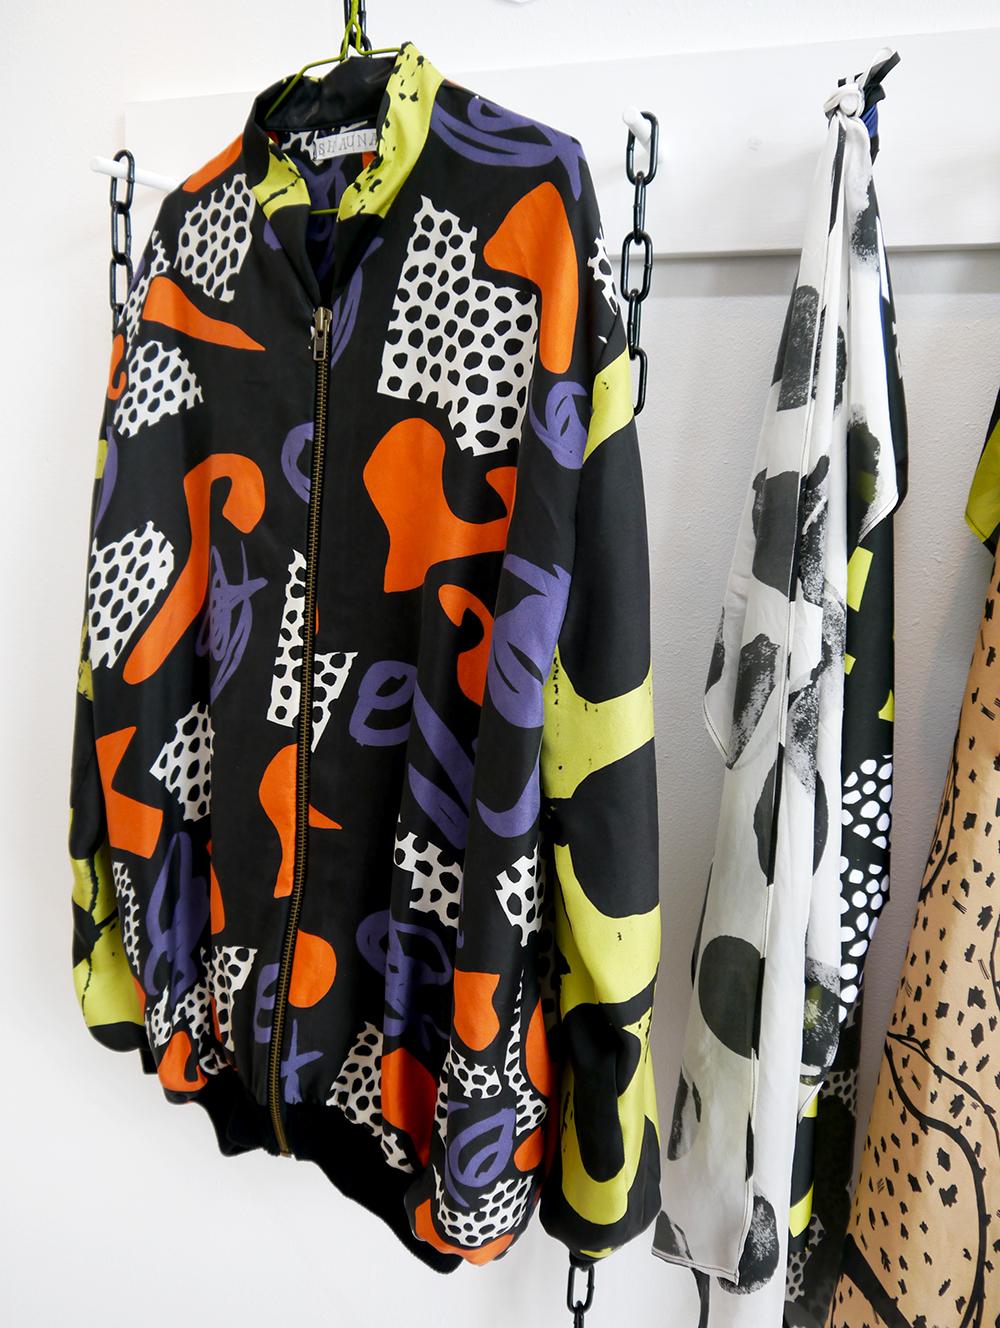 DJCAD, Duncan of Jordanstone College of Art and Design, degree show, Dundee, degree show 2015, #djcaddegreeshow, #djcaddegreeshow15, textile design, printed fabric, street style, street wear, Shauna McGregor